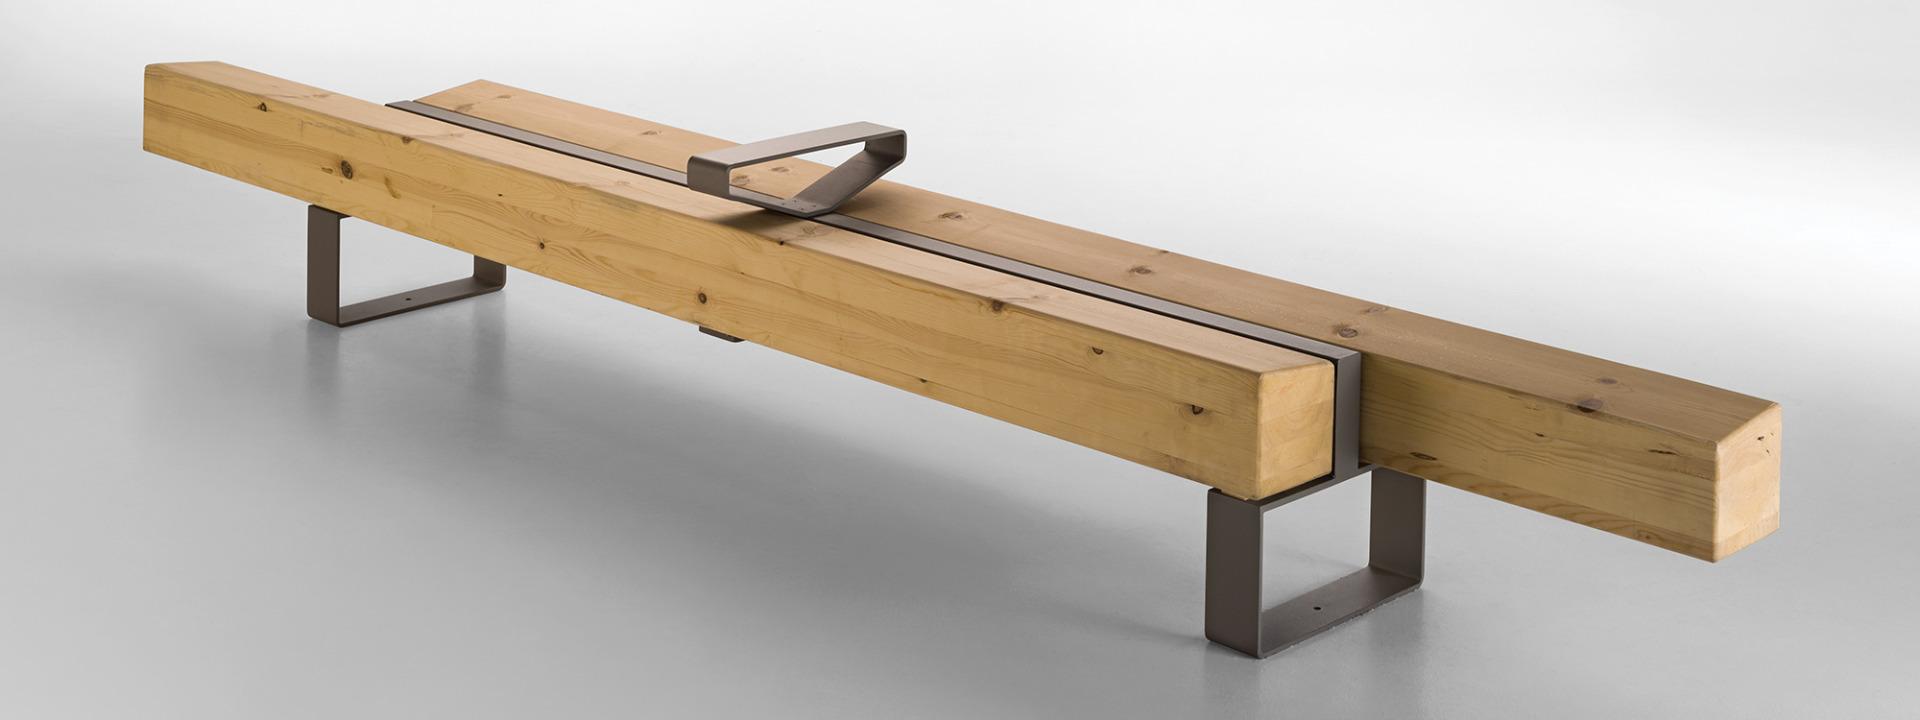 Foresta Bench Street Furniture Uk # Foresta Meubles